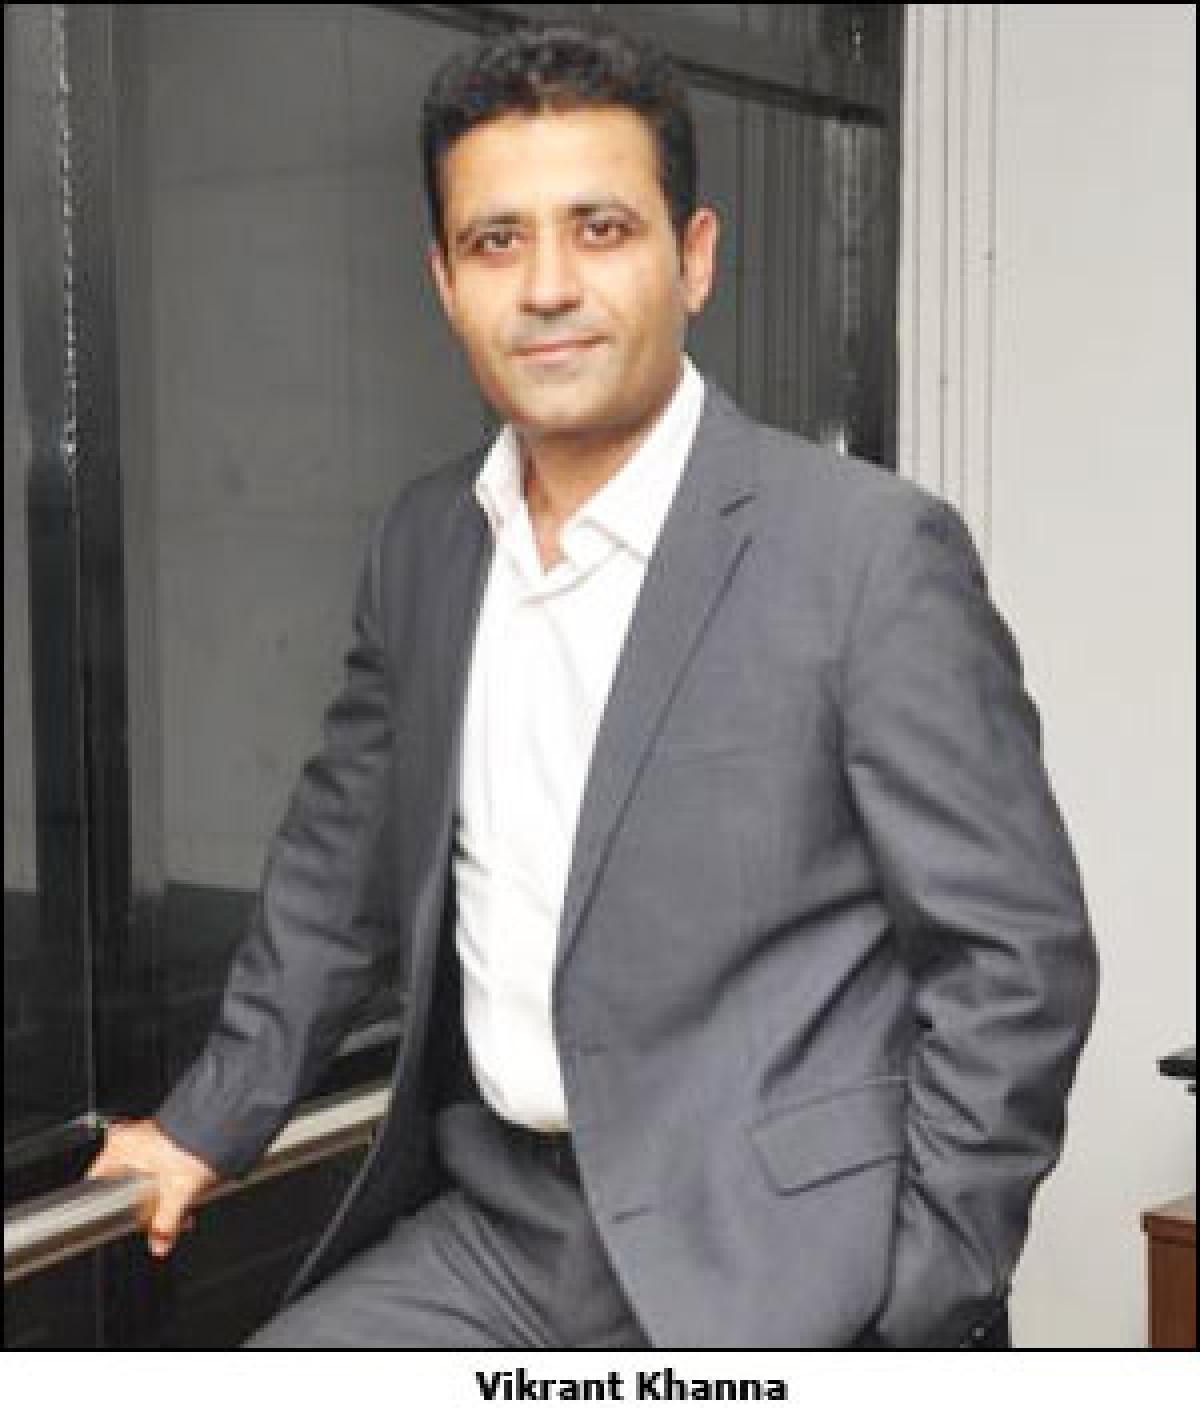 Profile: Vikrant Khanna: Insightful